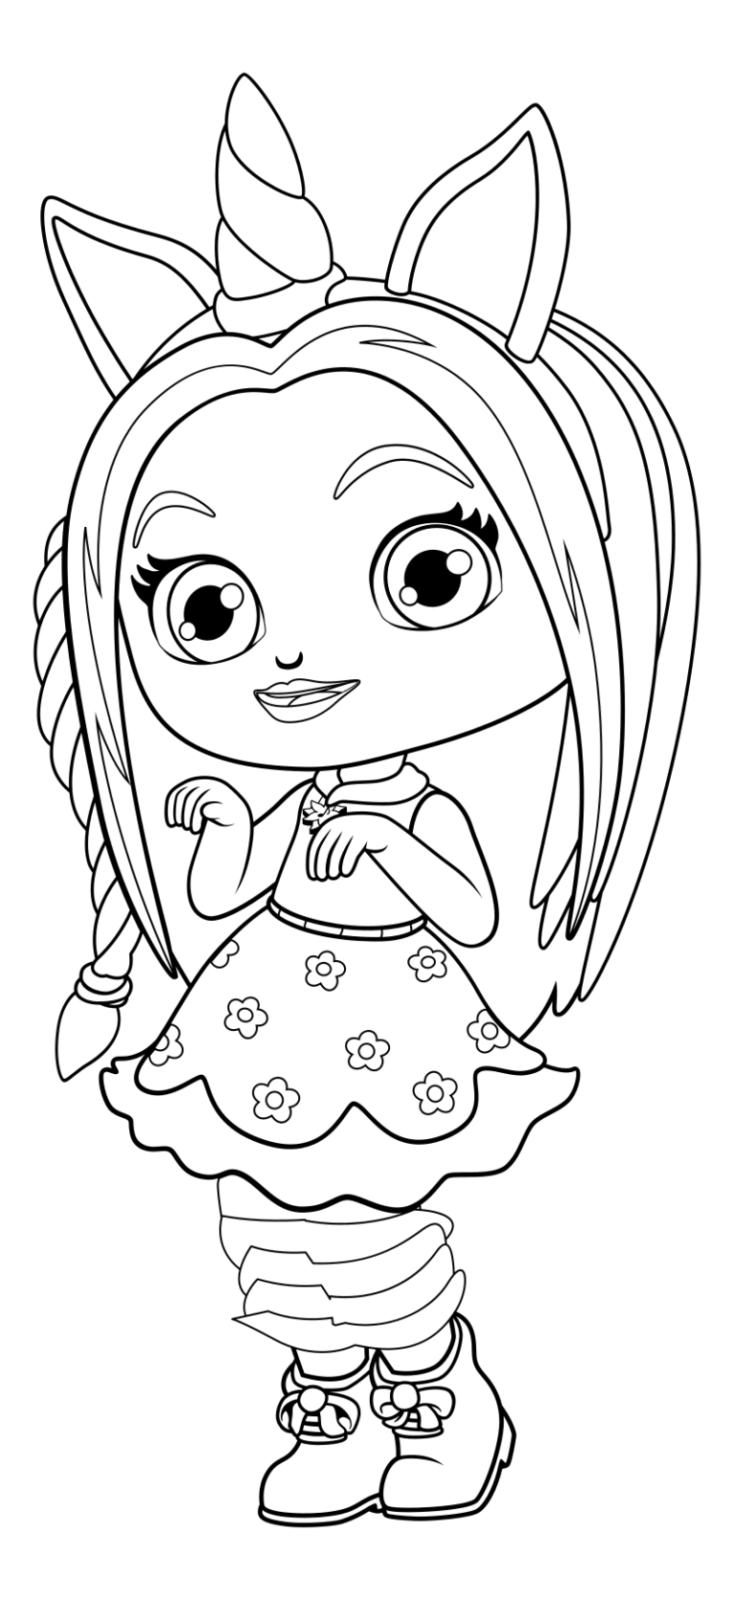 Раскраска кукла | andrey-eltsov.ru